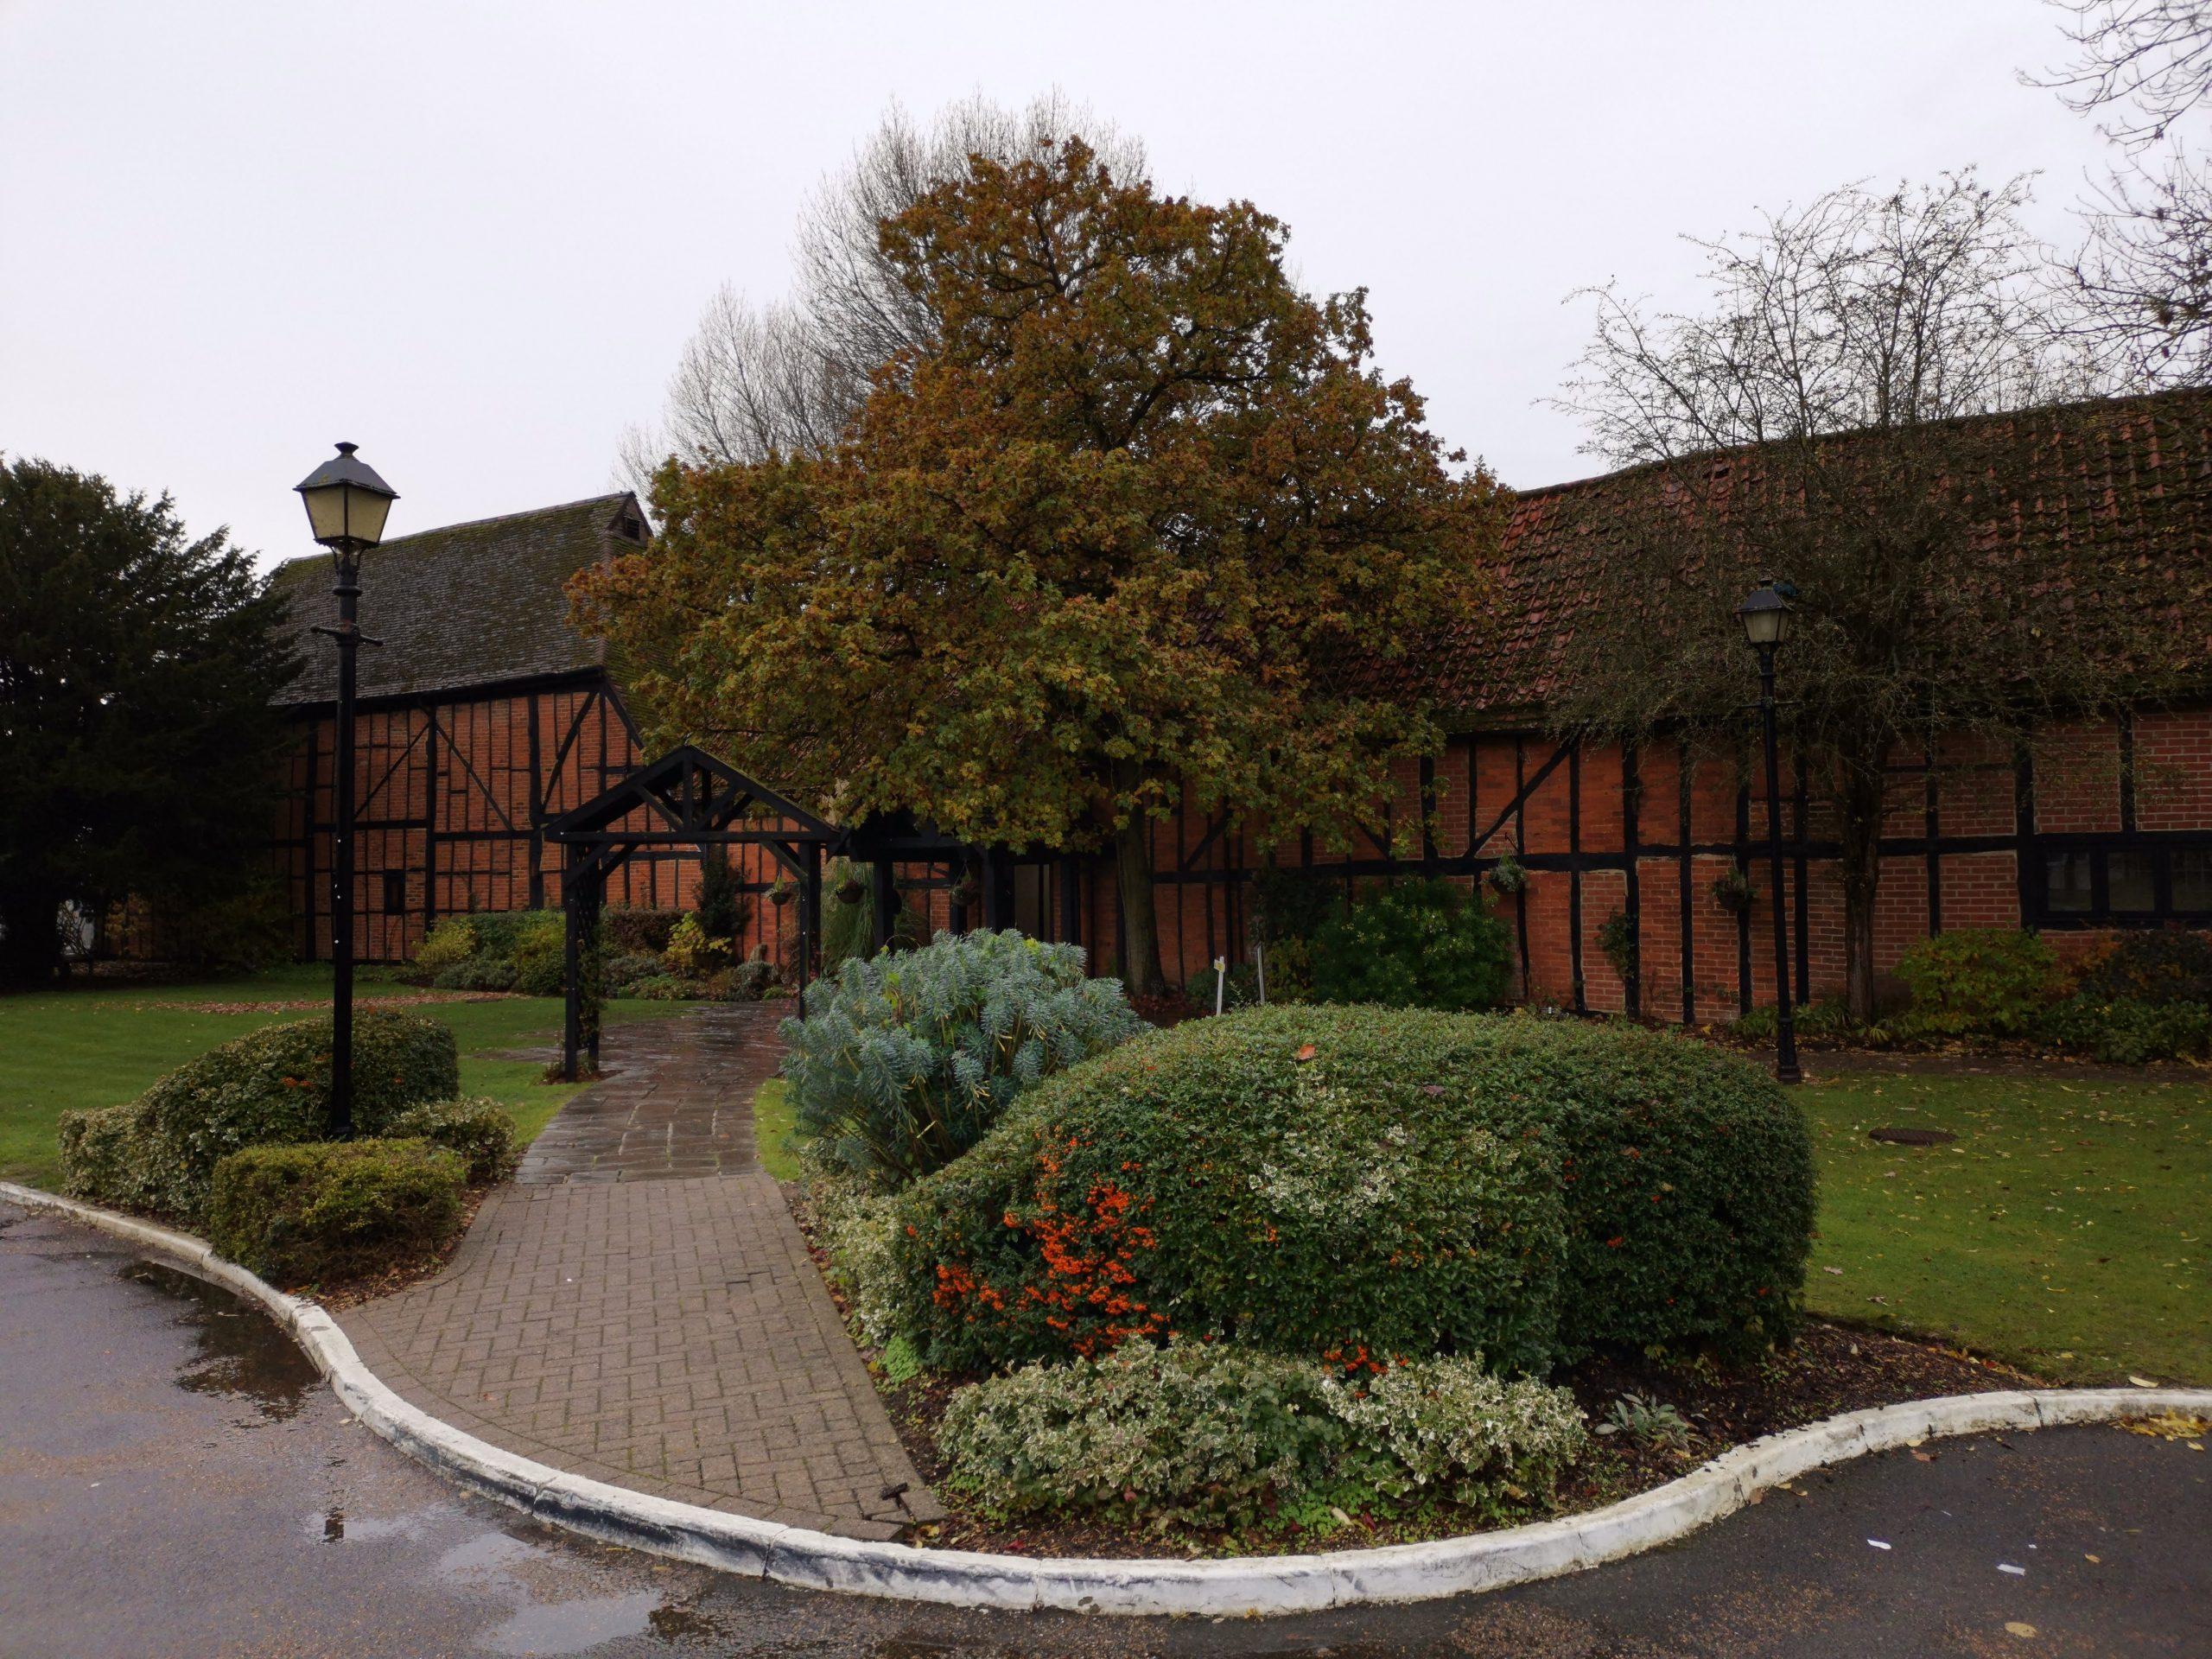 Venues I Love – The Barns Bedford